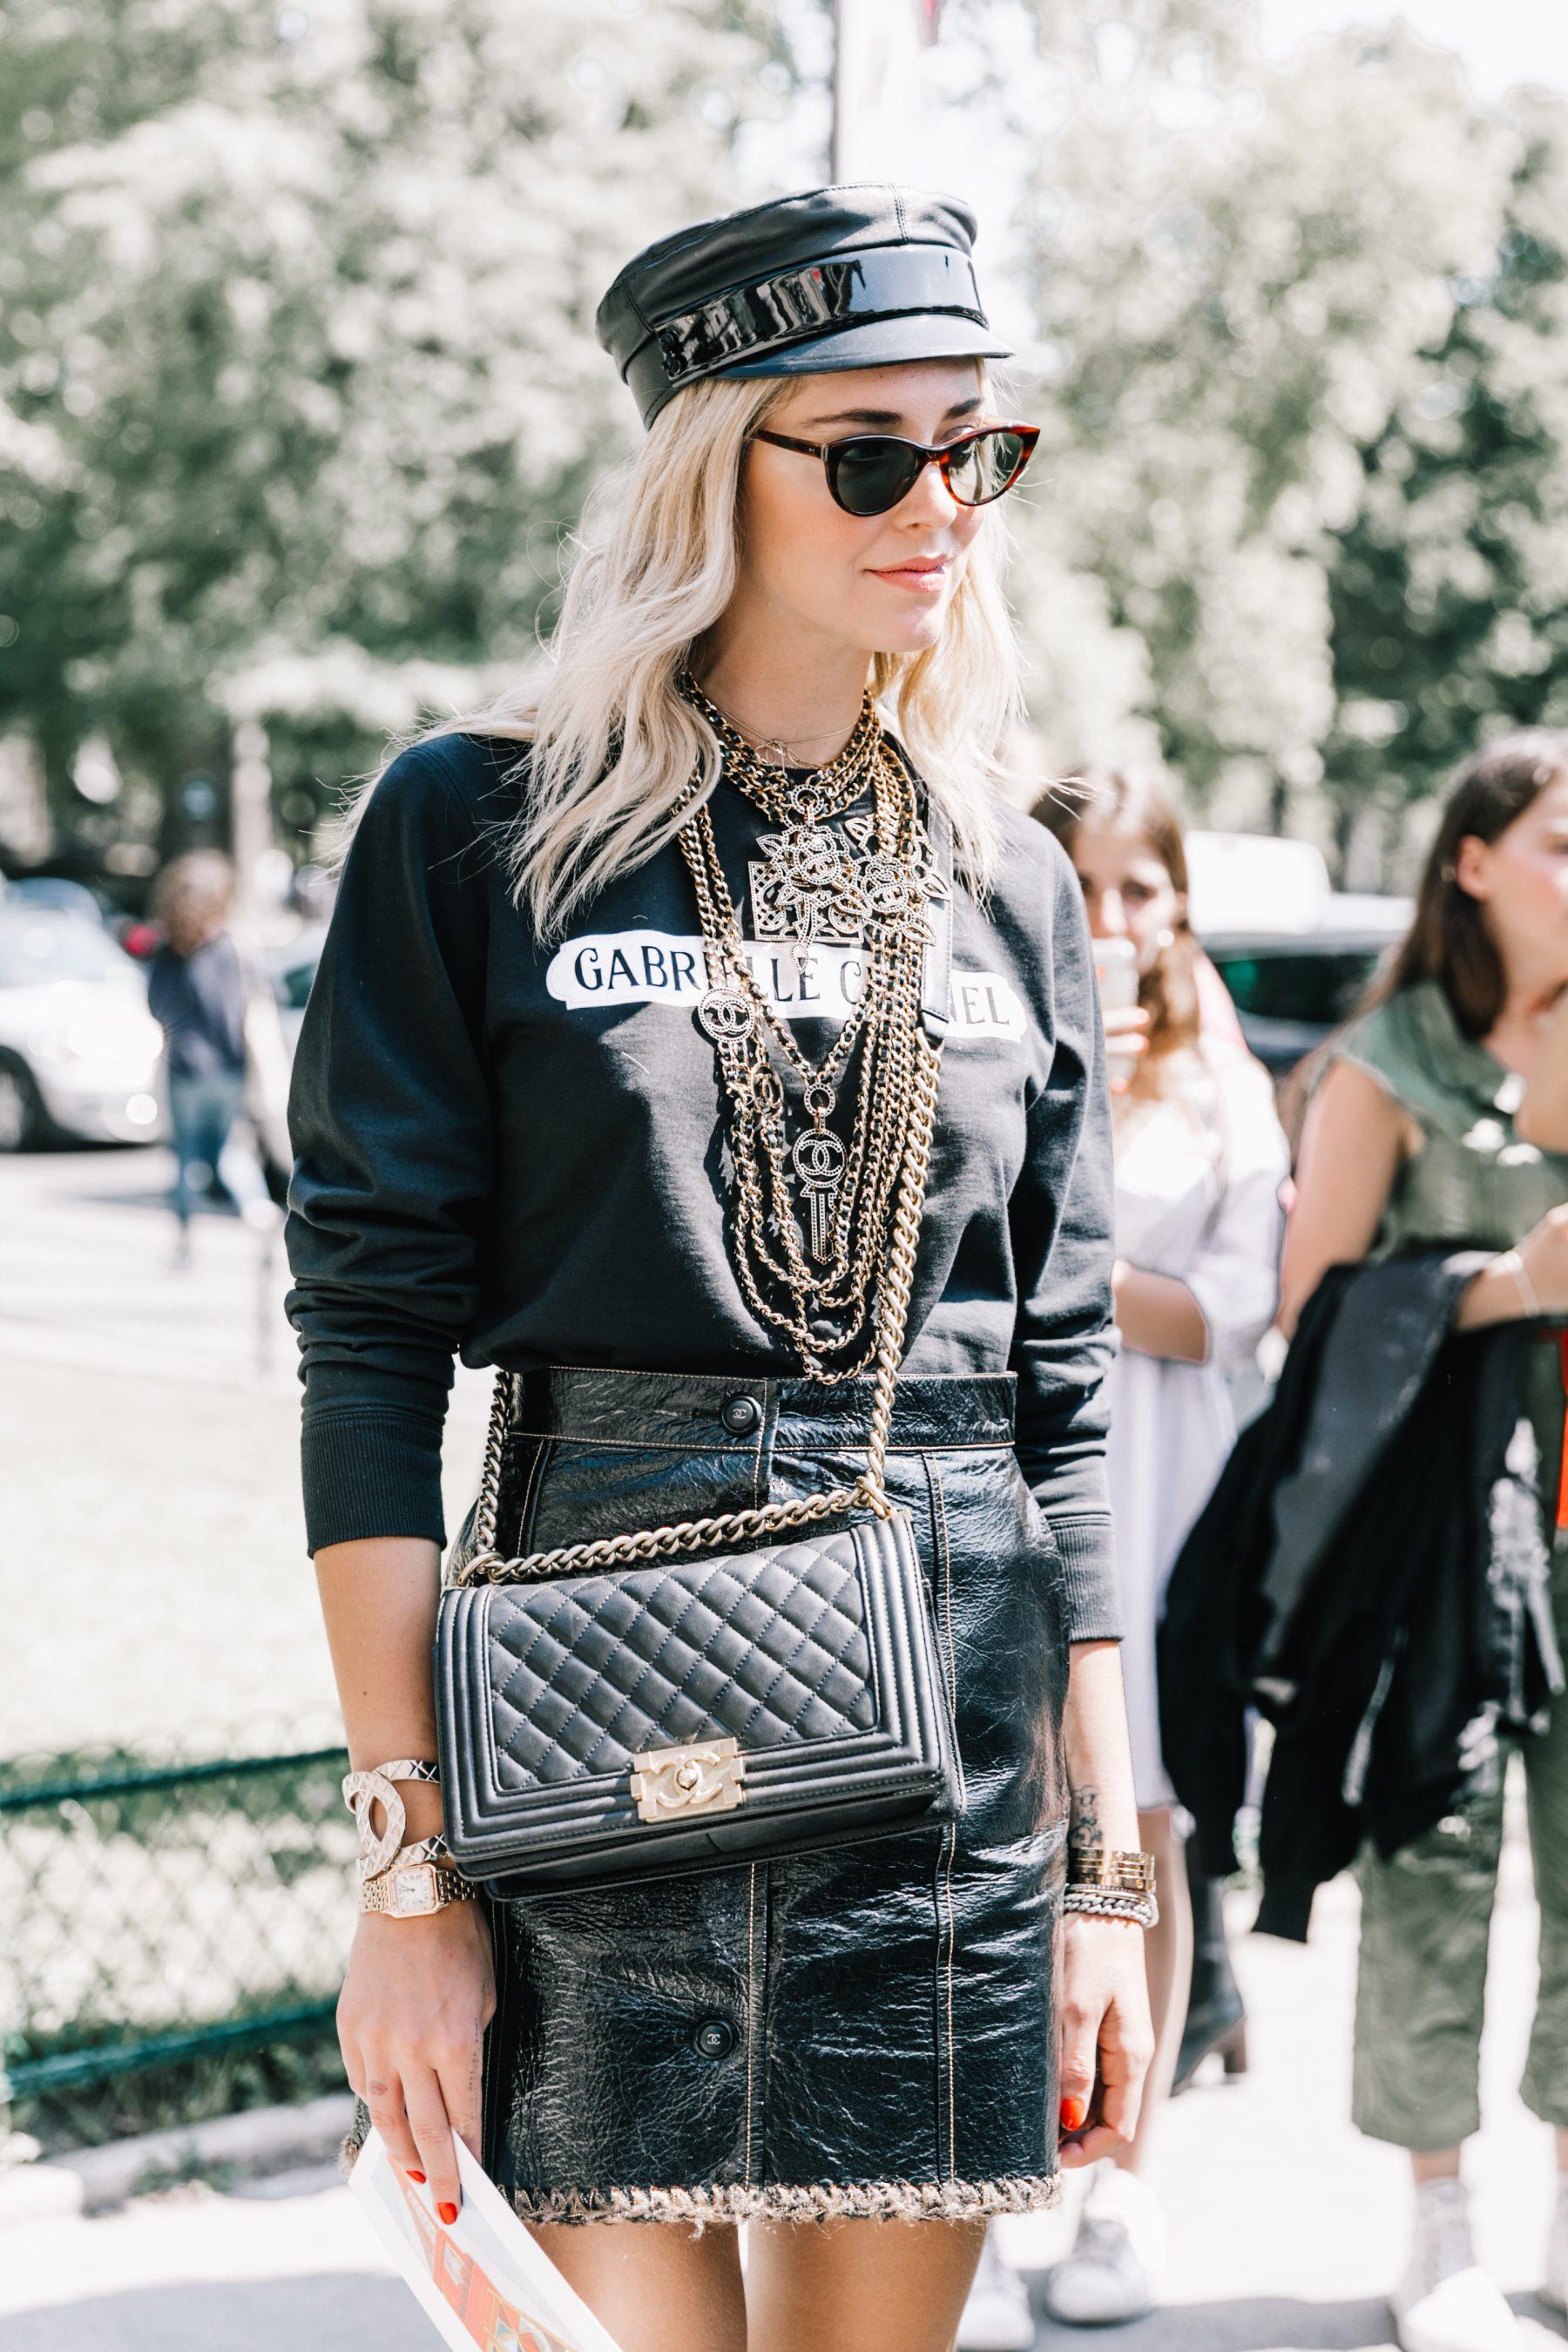 chiara ferragni túi xách chanel boy bag đen tuần lễ thời trang haute couture